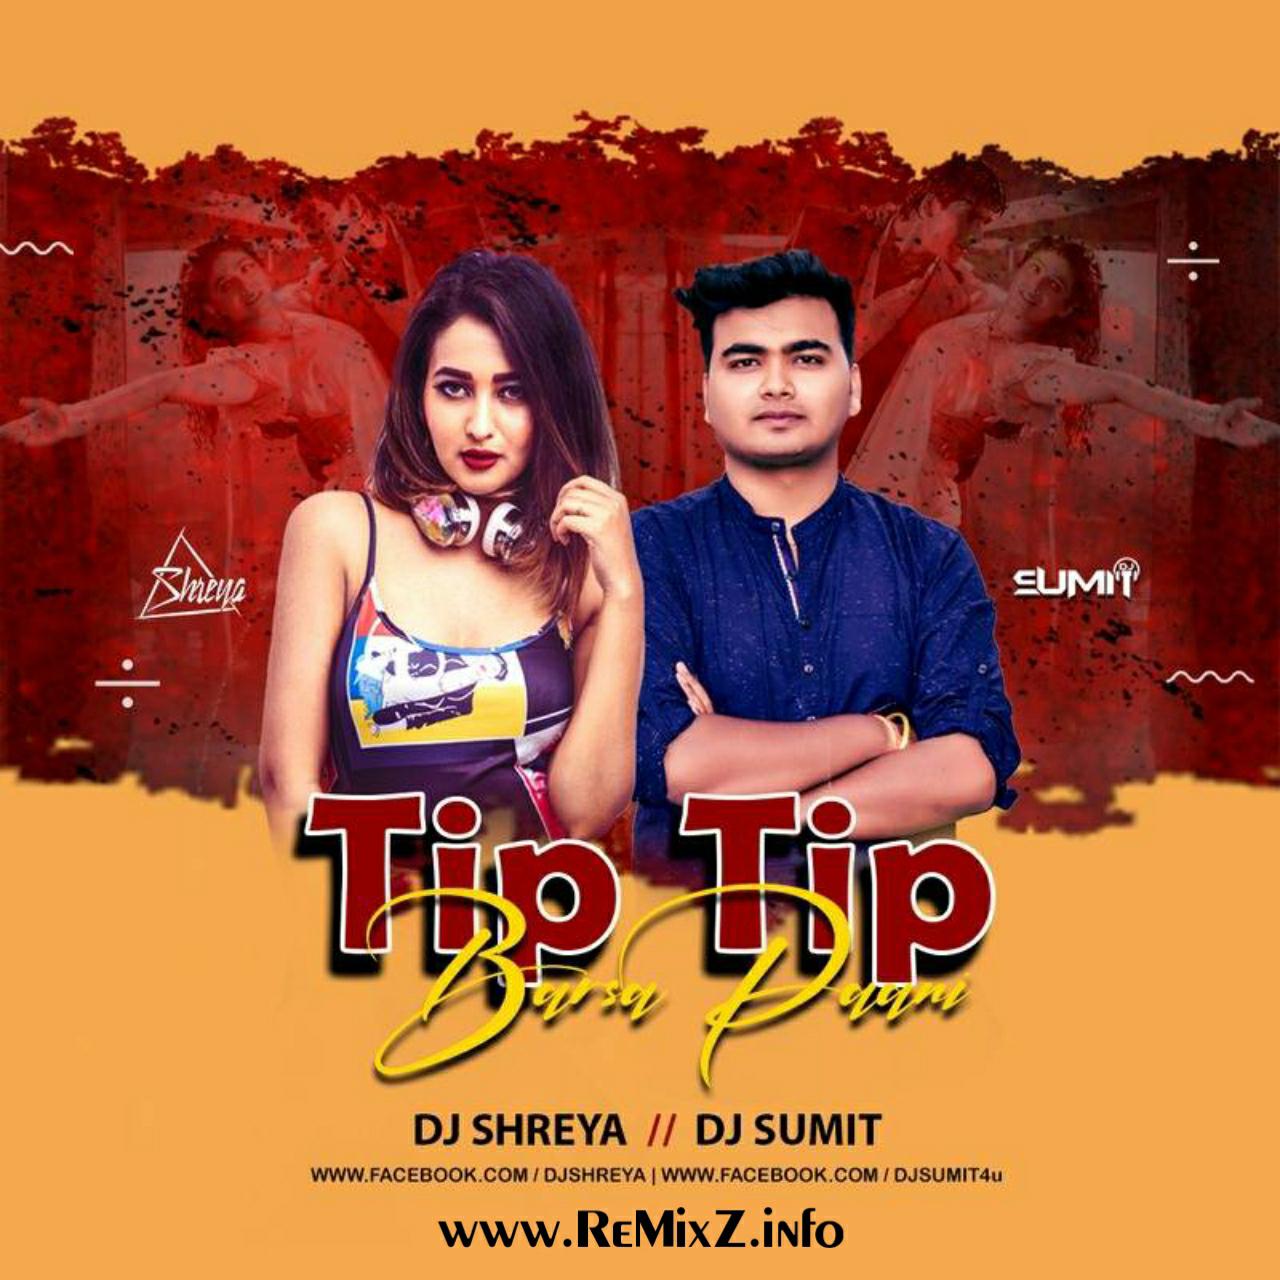 Tip-Tip-Barsa-Pani-Remix-DJ-Shreya-X-DJ-Sumit.jpg